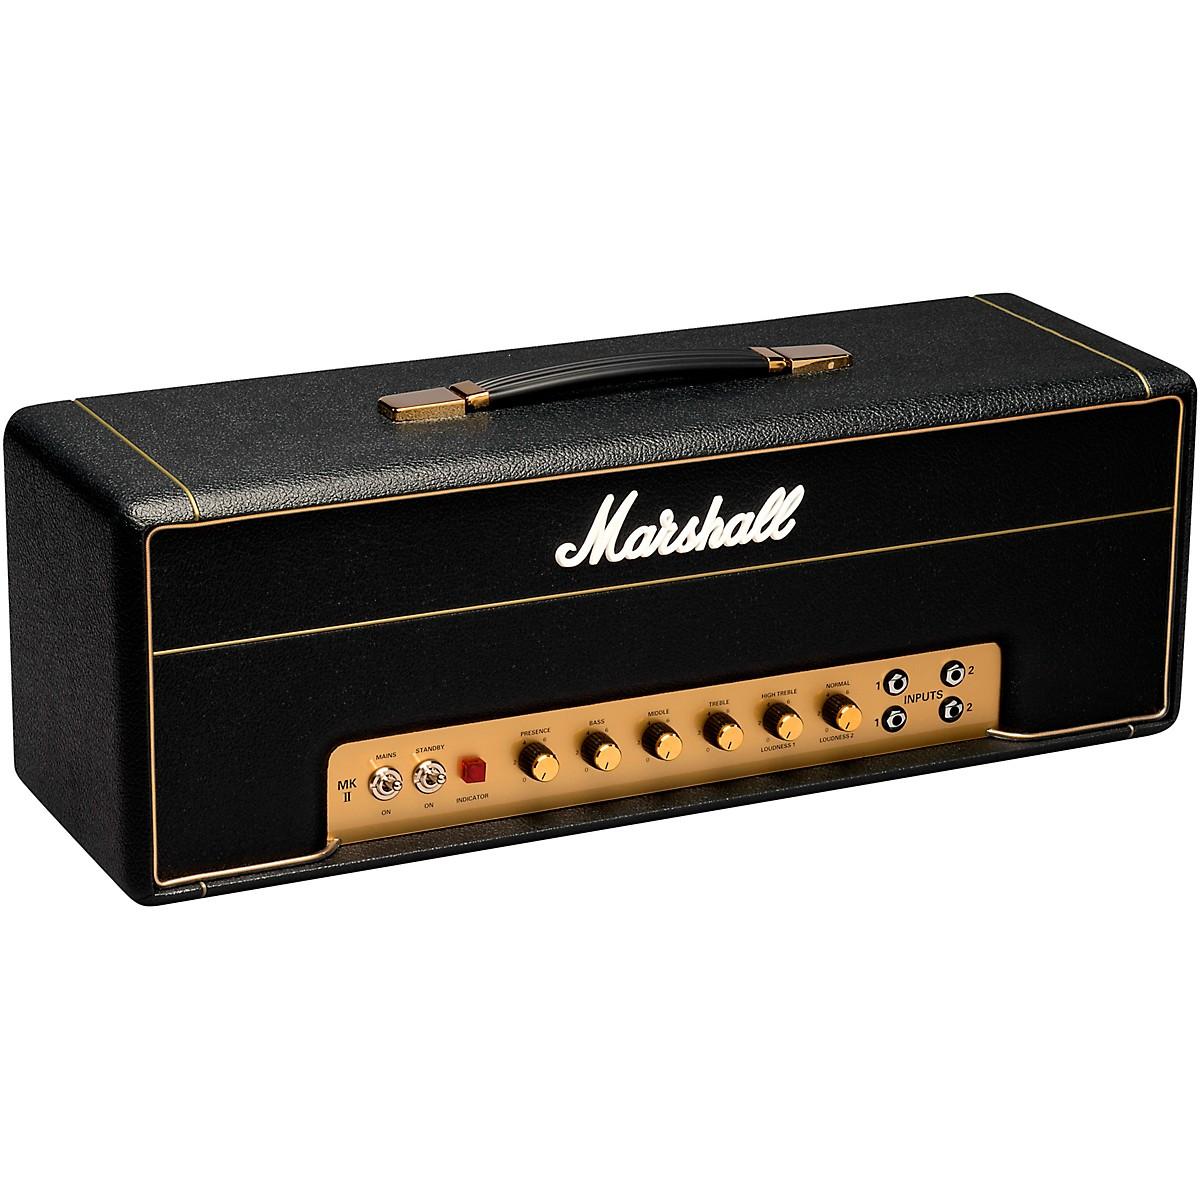 Marshall Vintage Series Plexi 50 Watt 3 Band EQ Tube Guitar Amplifier Head with FX Loop